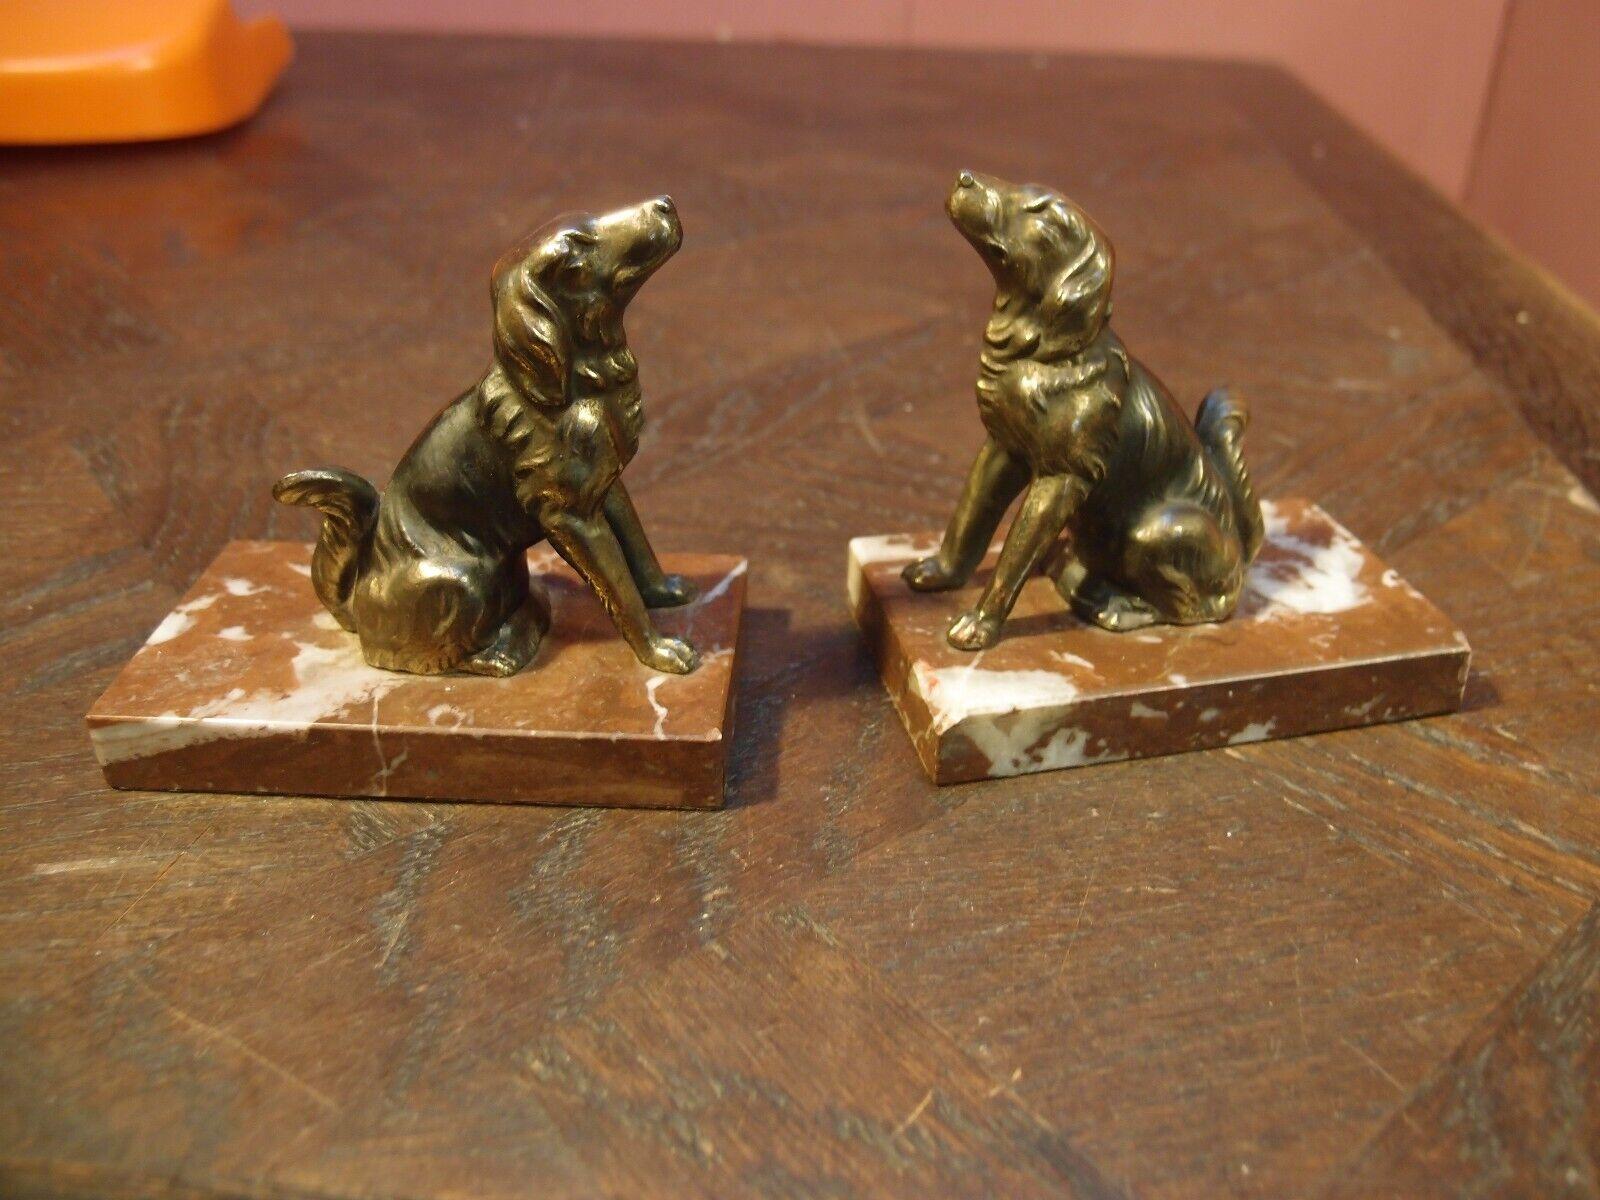 ORIGINAL PAIR of ANTIQUE ART DECO MARBLE & CAST METAL  DOGS  BOOKENDS